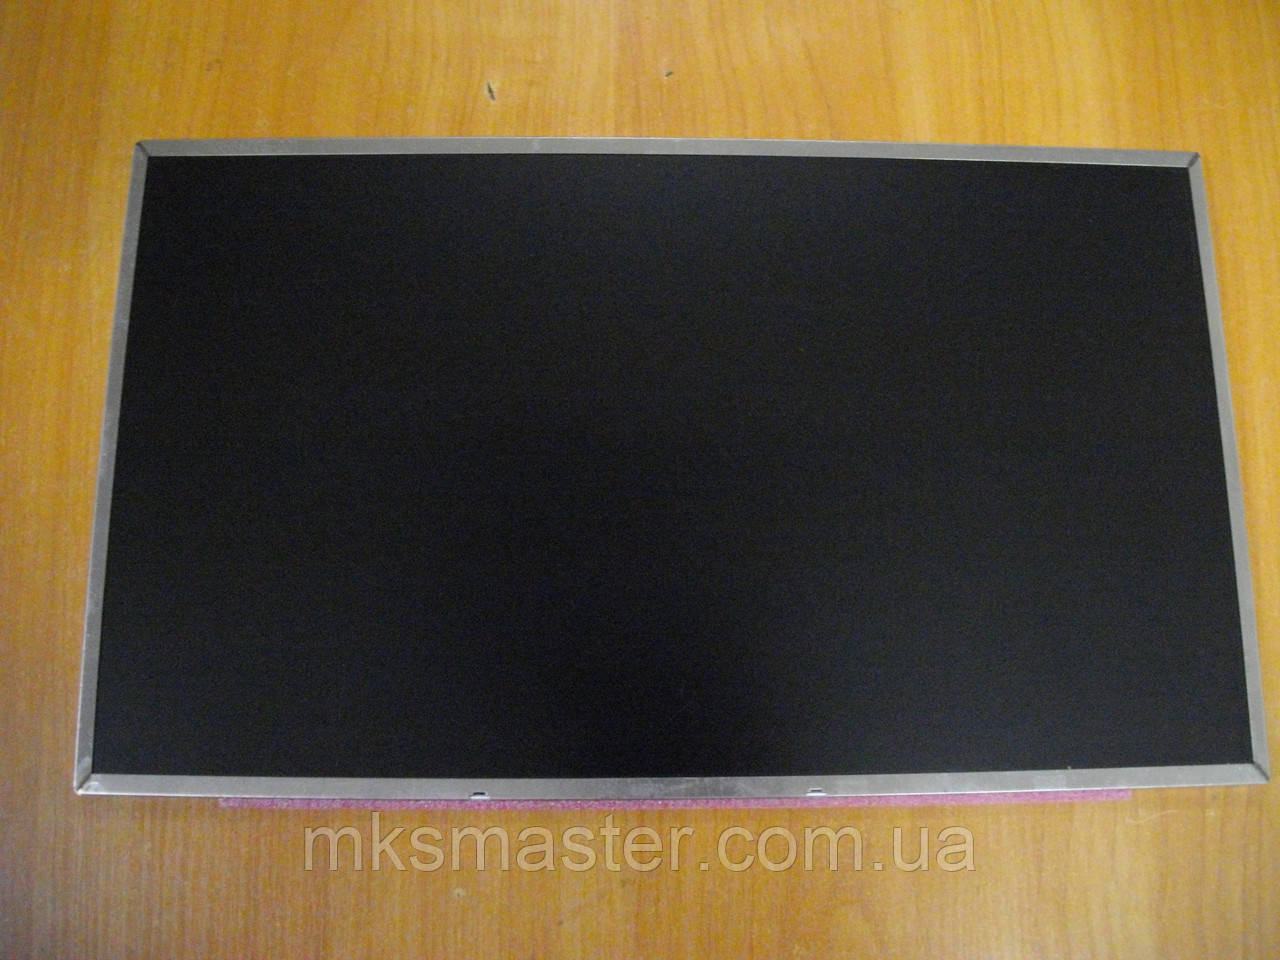 Экран матрица для ноутбука 15.6 LTN156, LTN156AT05 БУ ОРИГИНАЛЬНАЯ